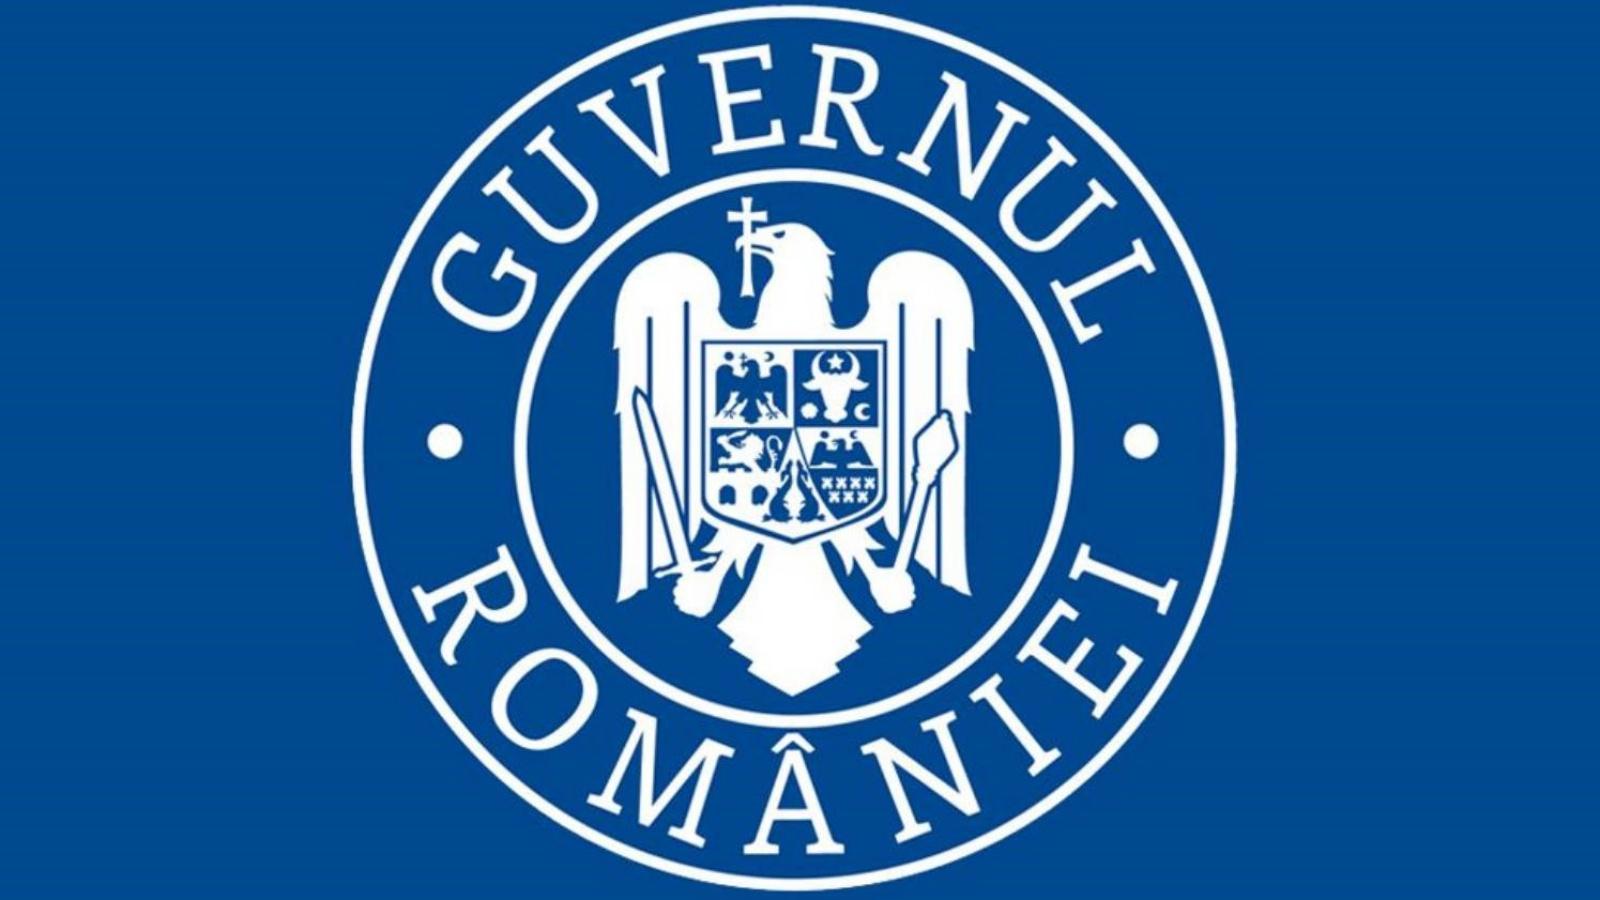 Guvernul Romaniei zonele romania cazuri coronavirus delta